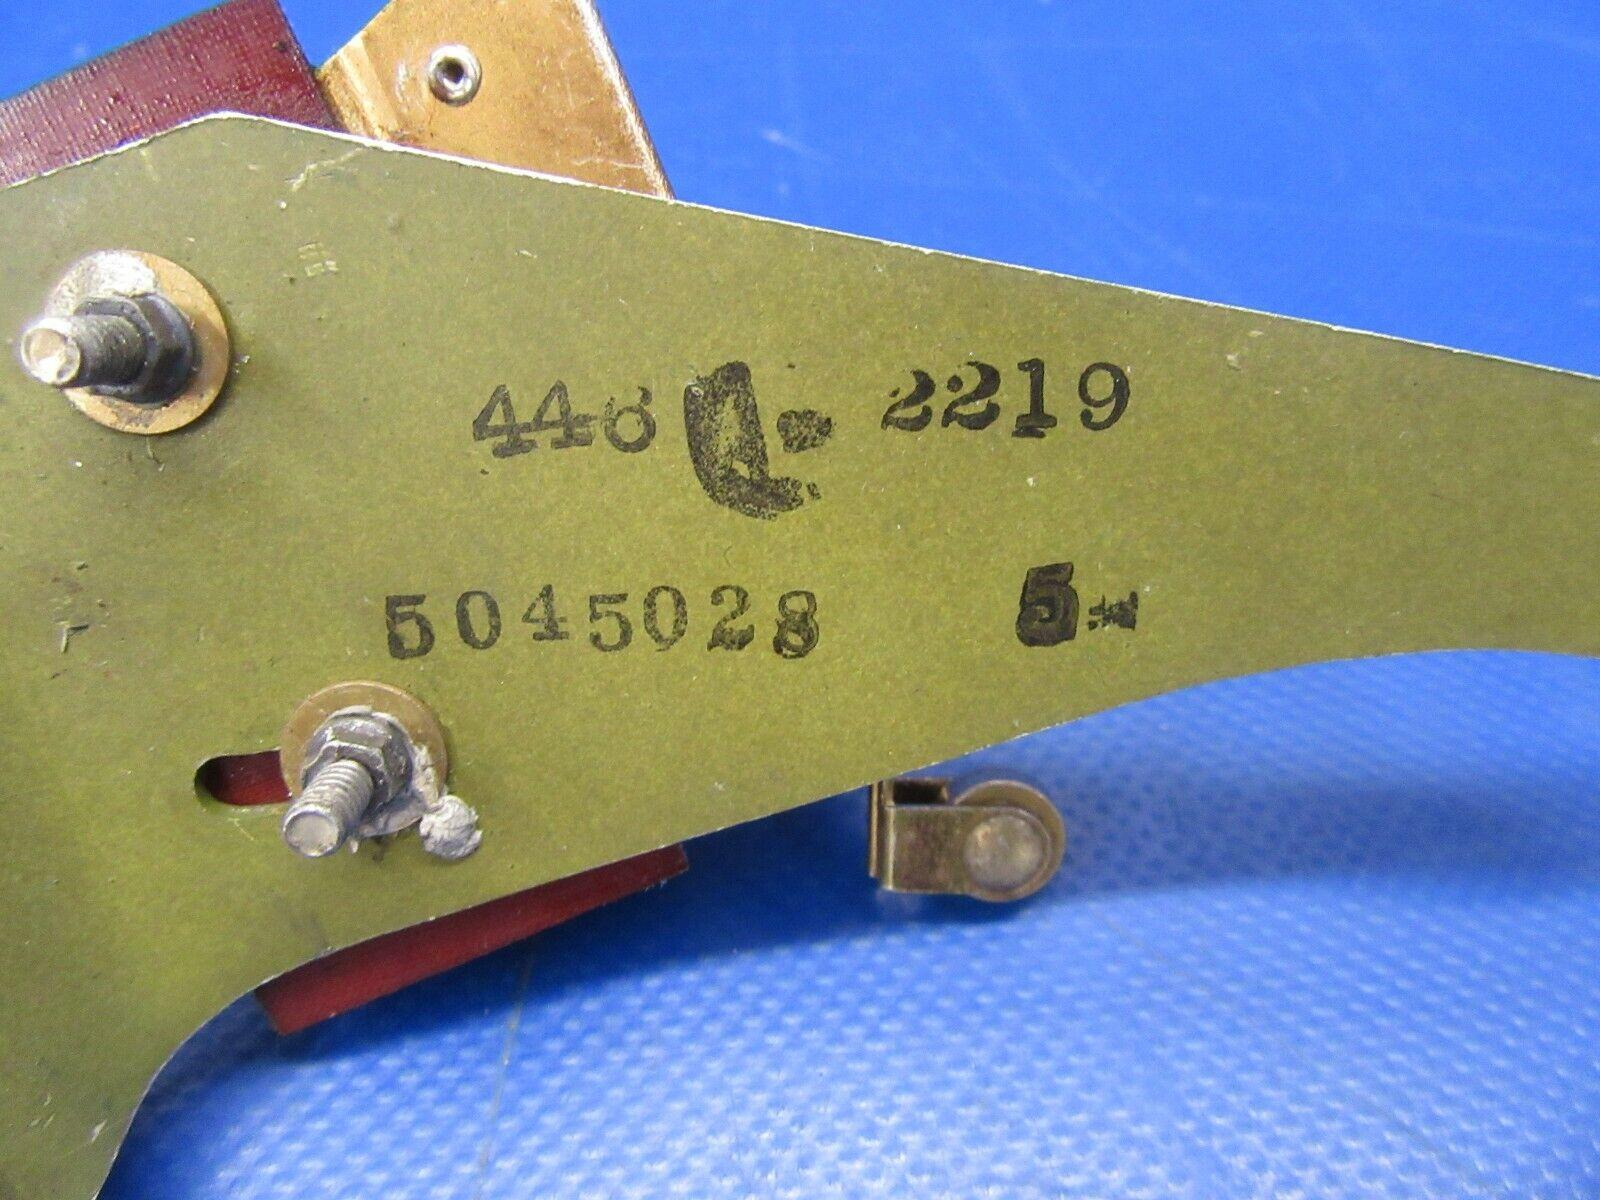 Cessna 310 R Up Limit Switch & Bracket BZ7RT04 & 5045028-5 (0219-260)